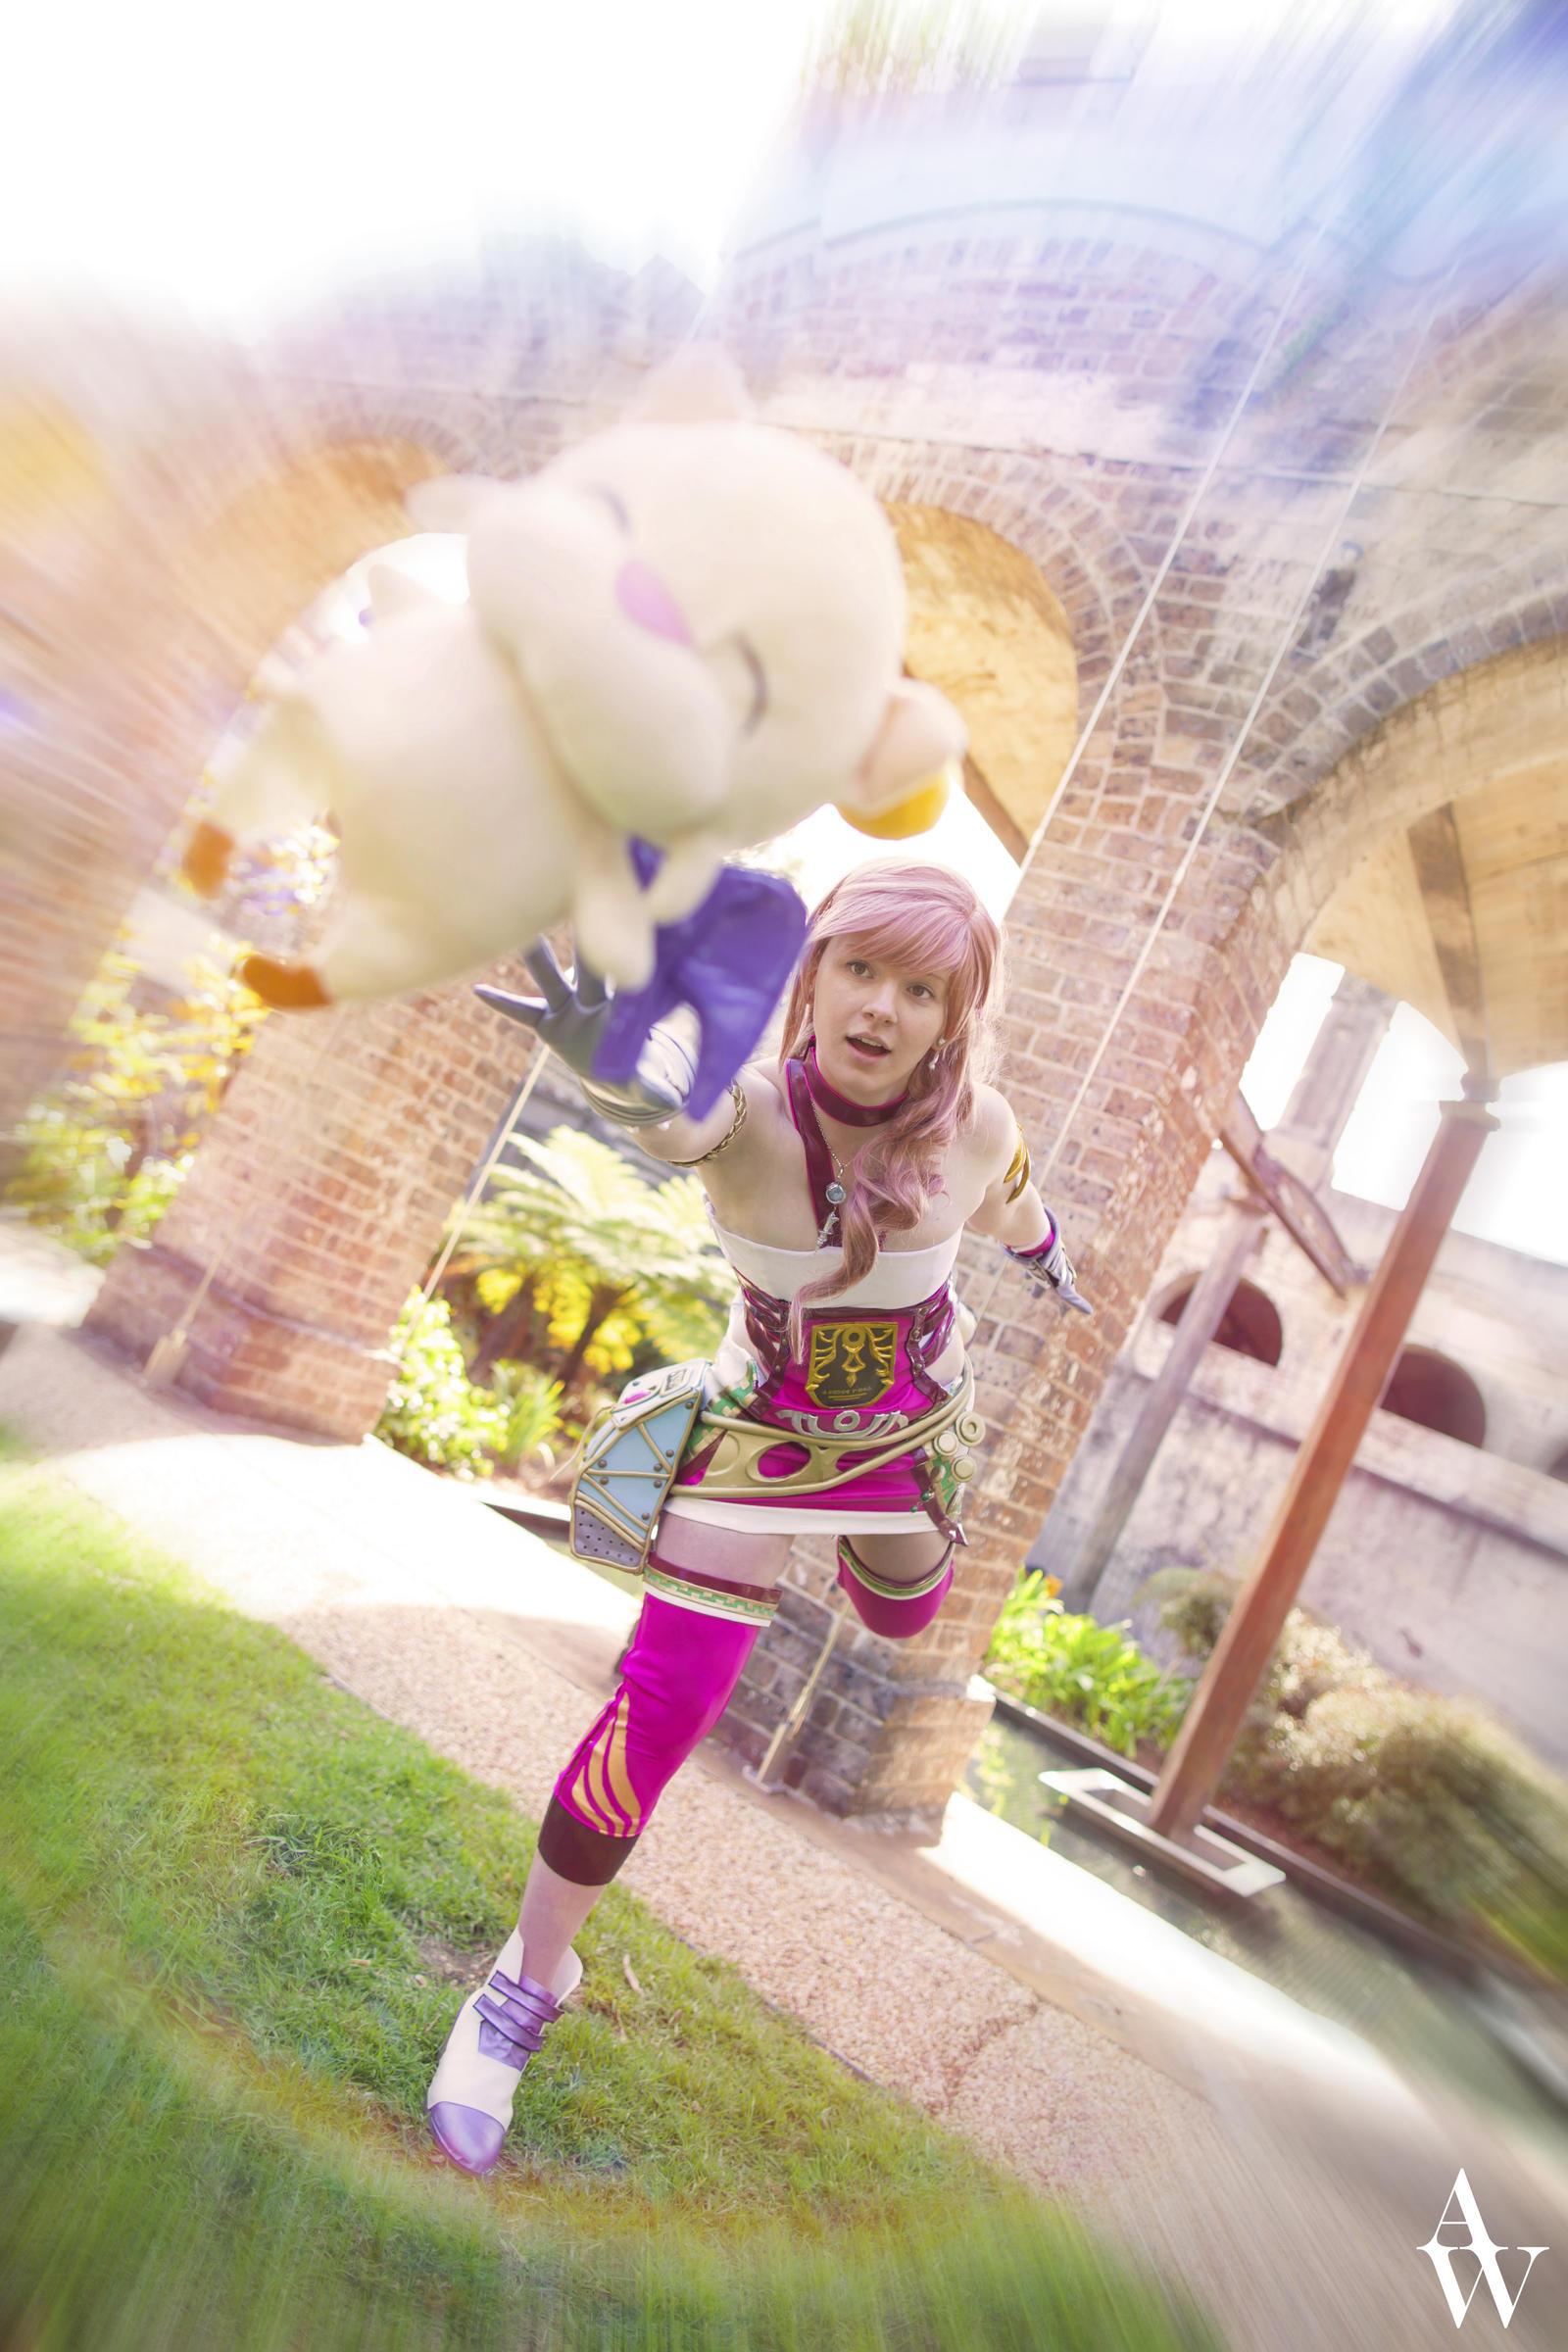 Kupoo!~ Serah Farron (Final Fantasy XIII-2) by AndyWana